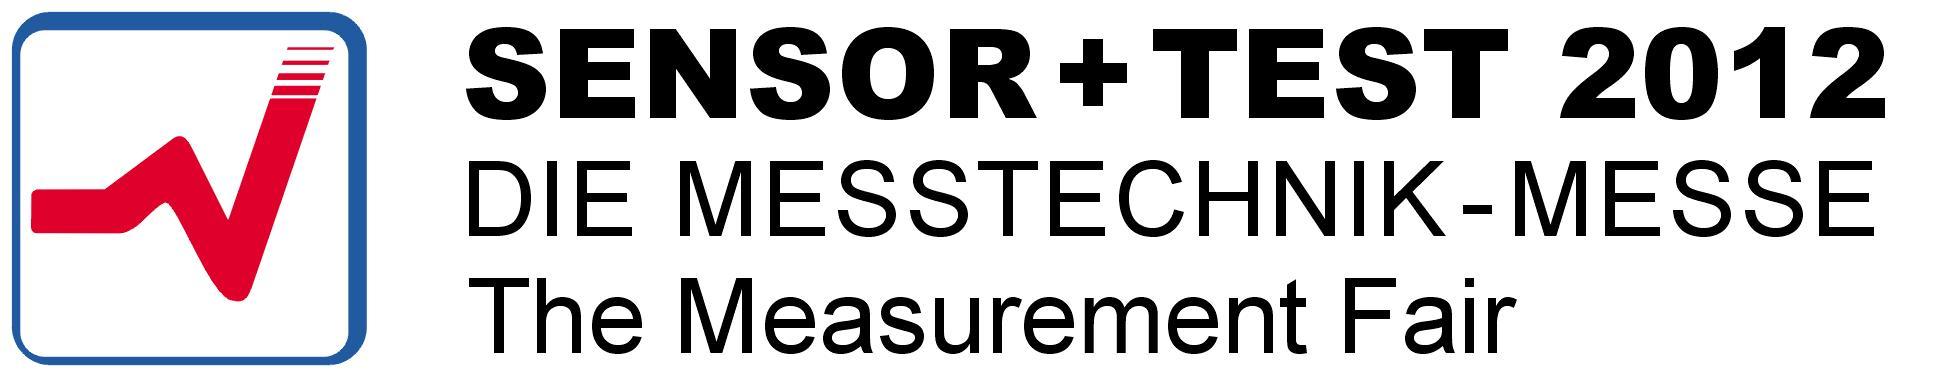 SENSOR+TEST 2012